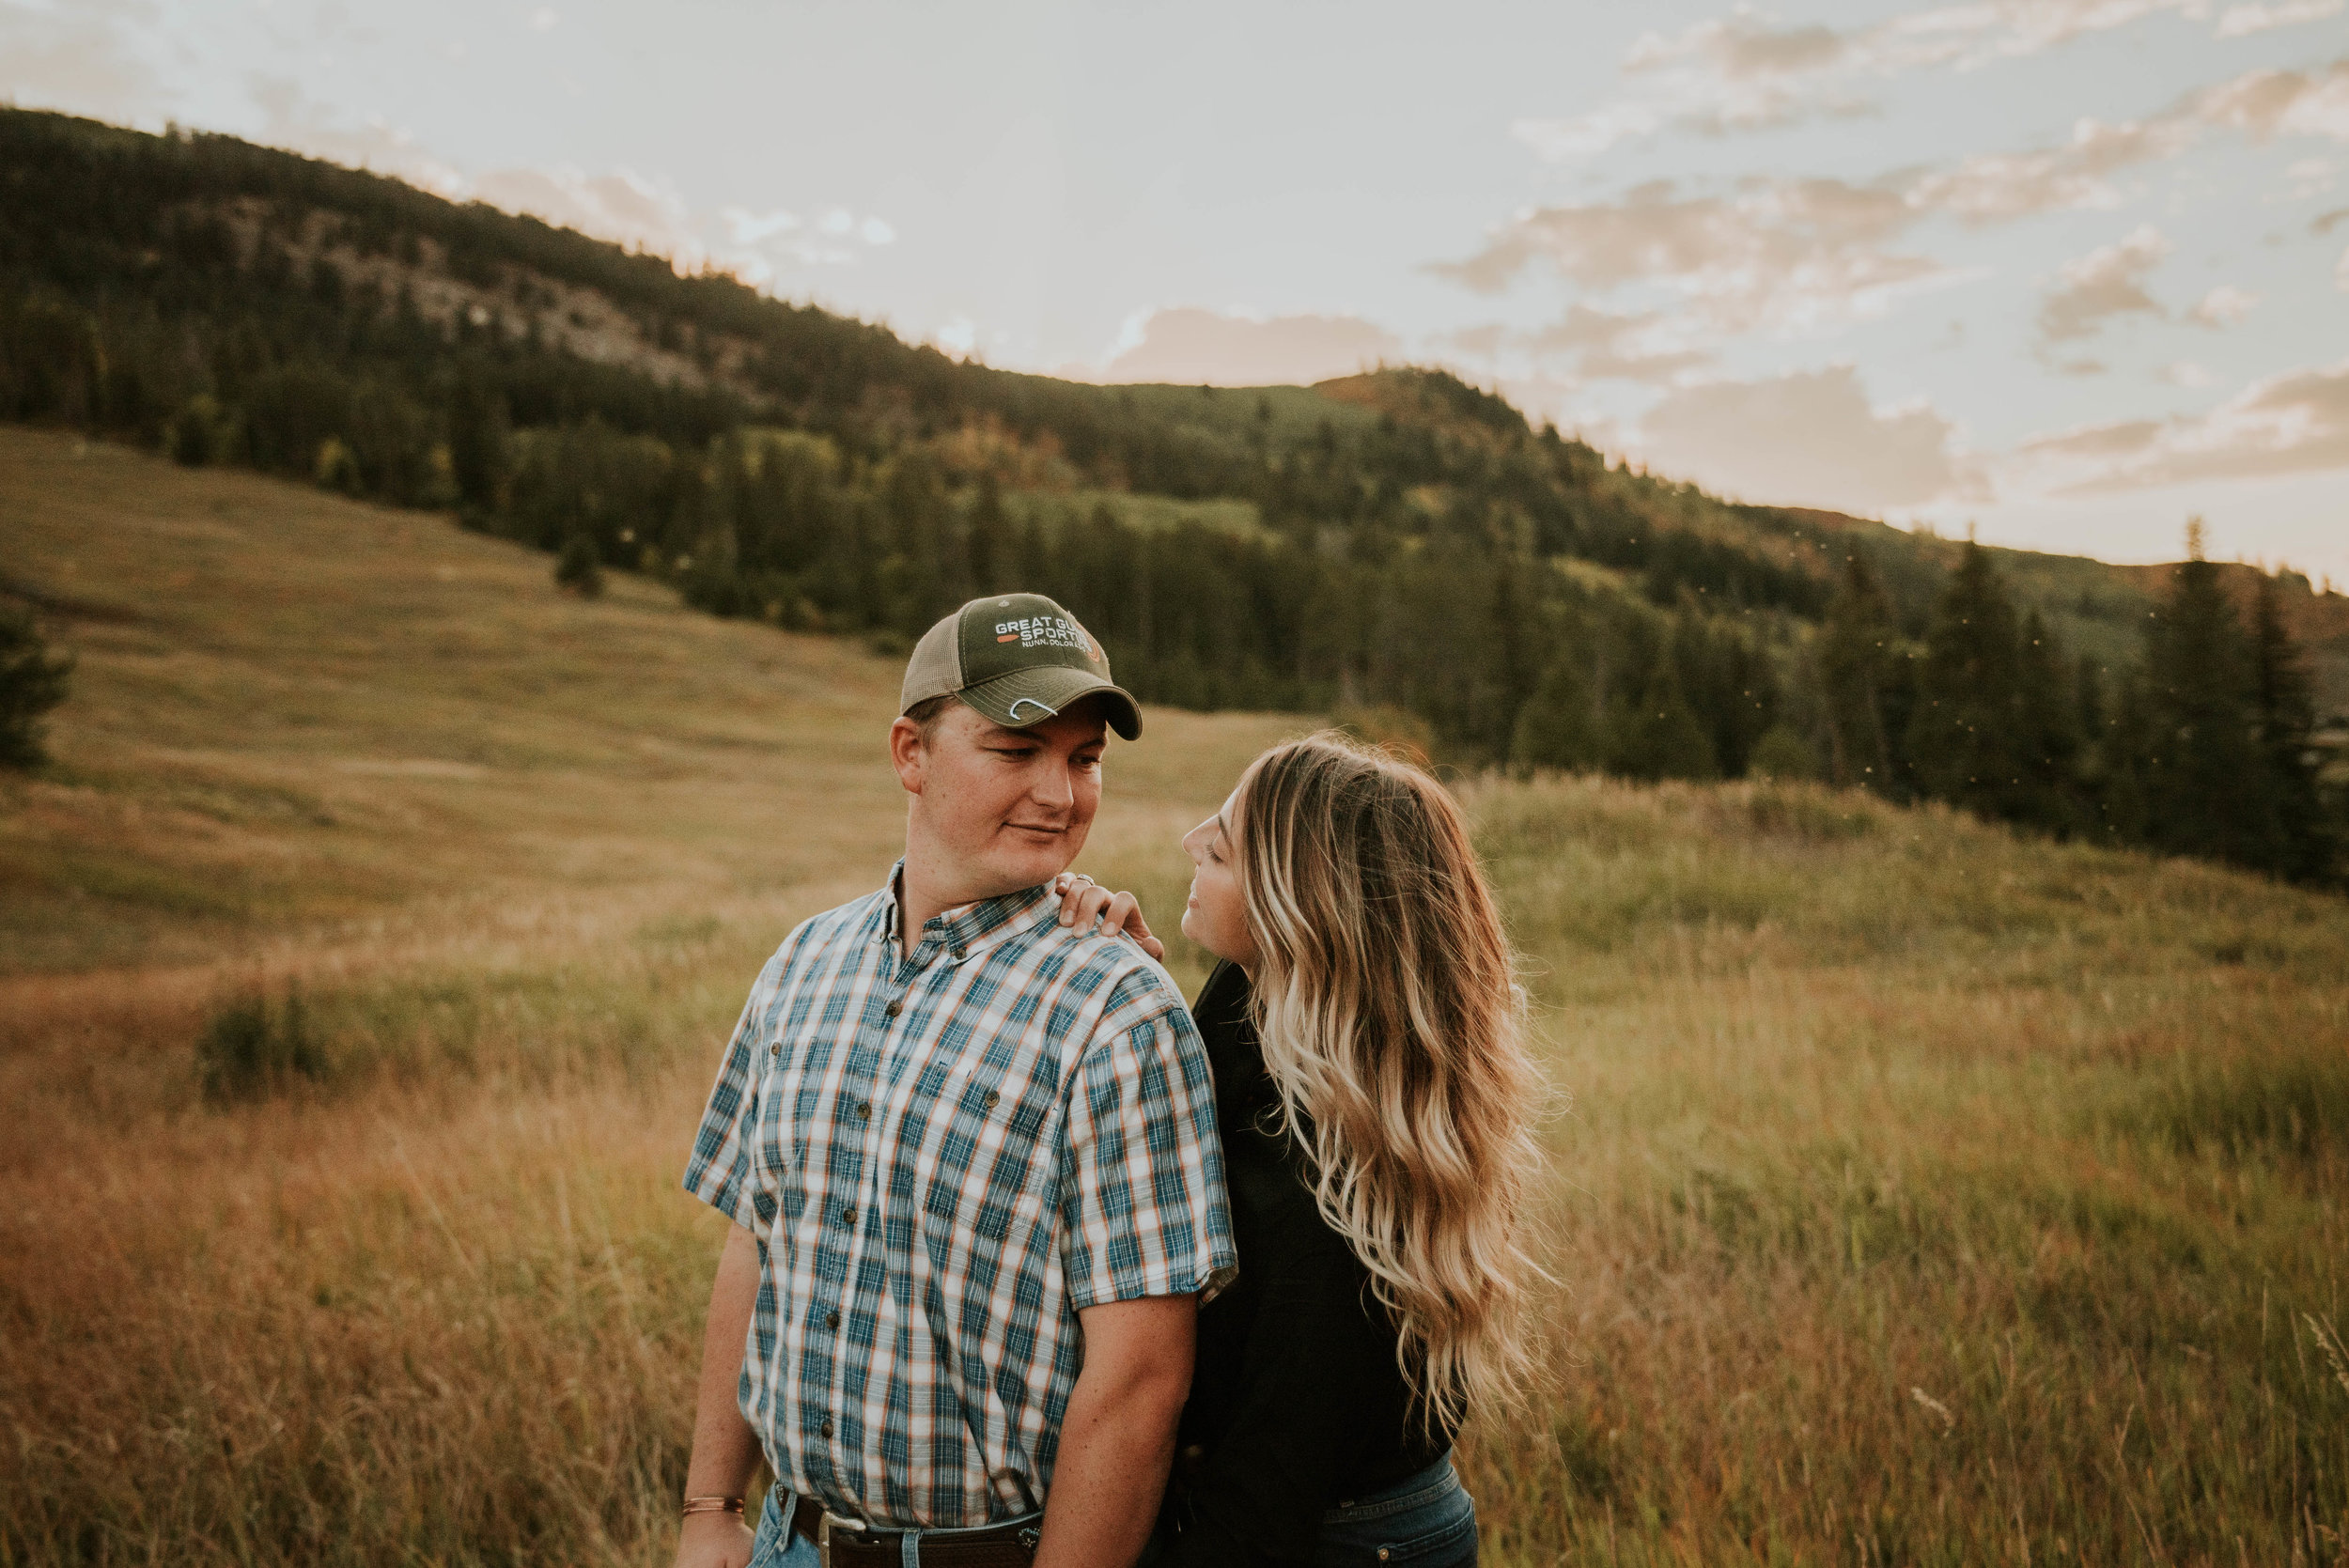 Miss. Miller's Photography | Colorado Wedding Photographer | Vail Colorado | Vail Wedding | Colorado Engagement Photos | Vail Wedding Photographer | Engagement Photos | Mountain Engagement Photos |